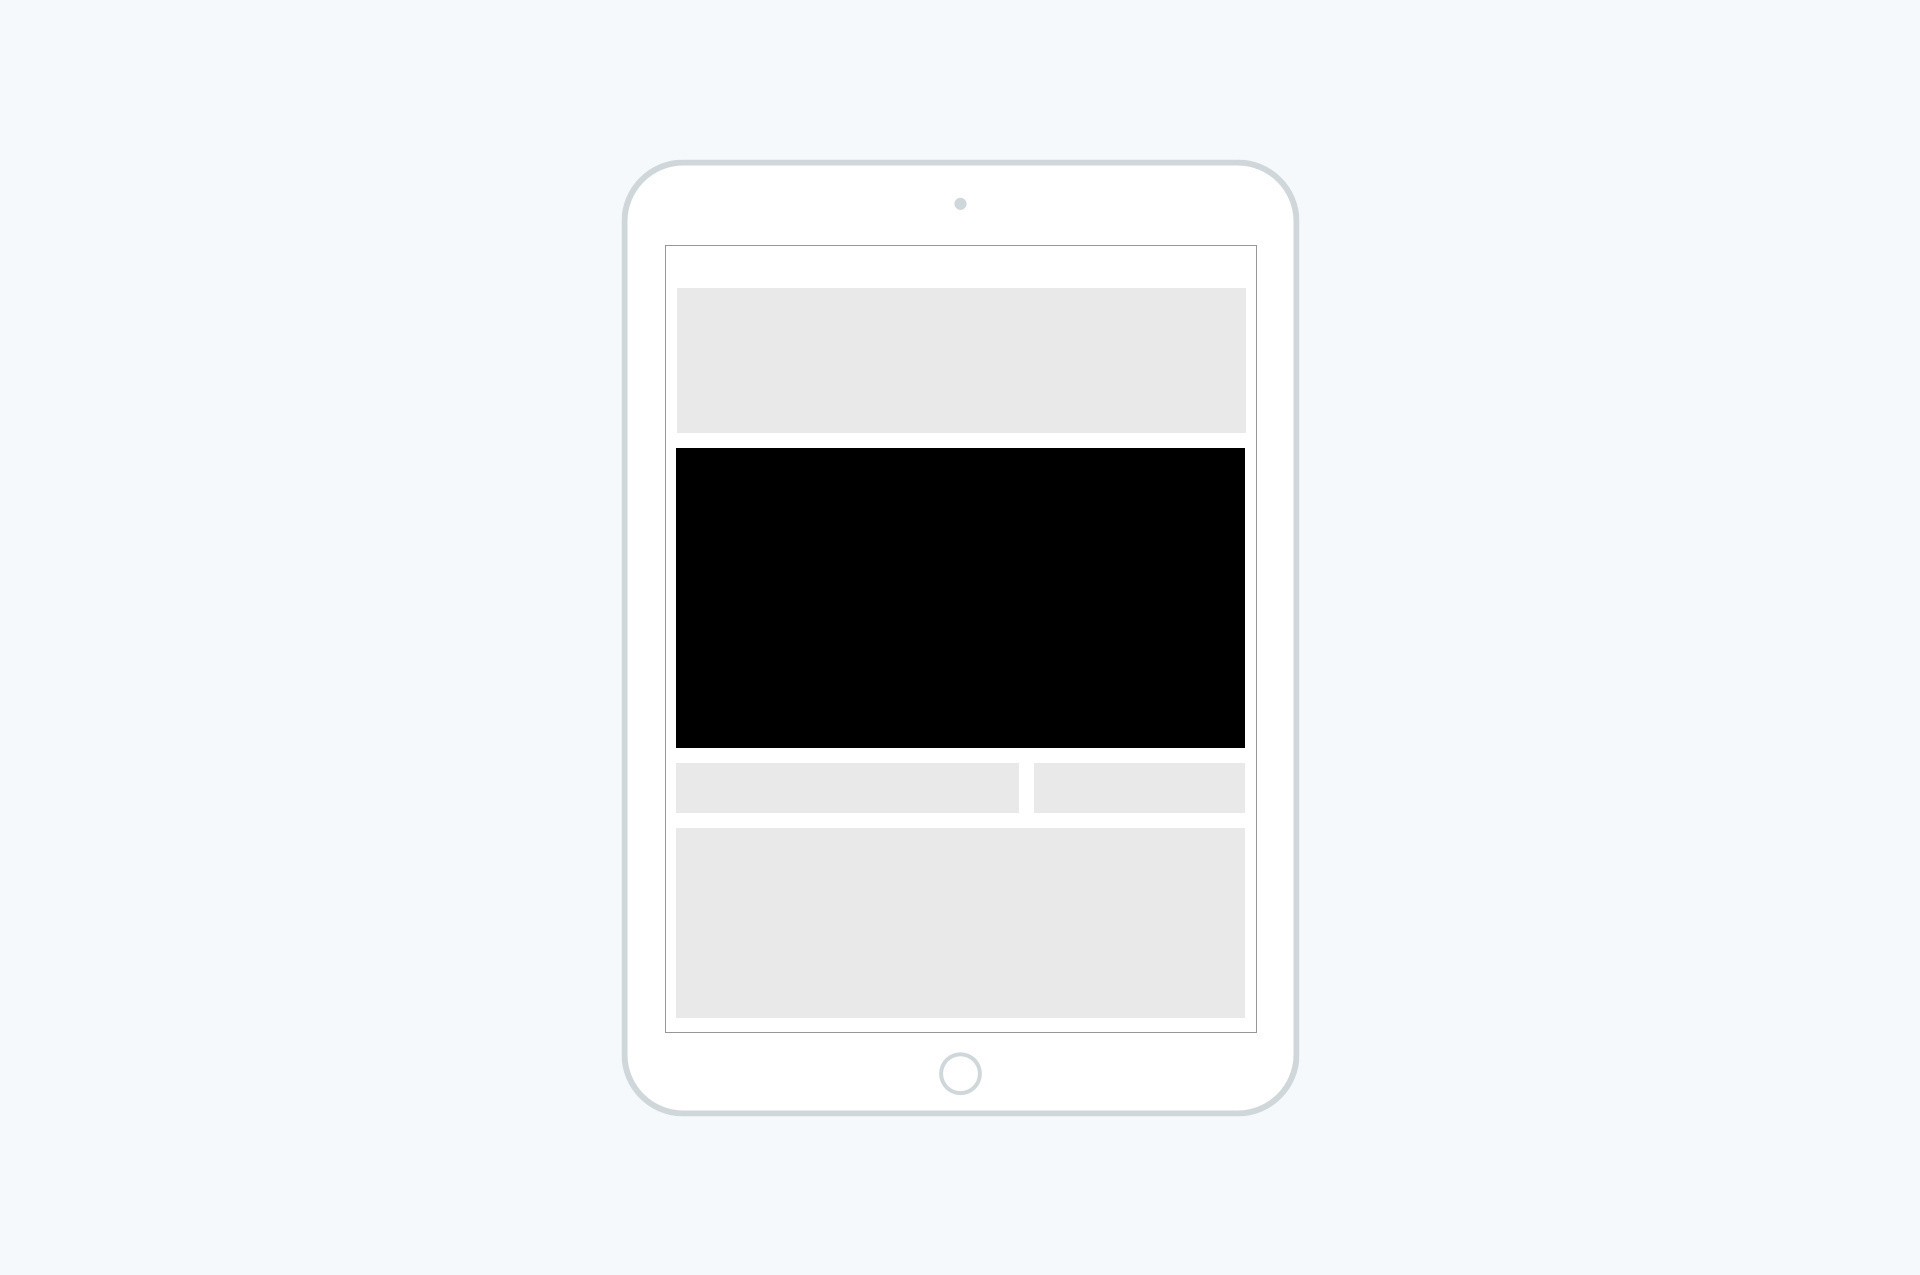 Tablet (kun forside) - Brandboard